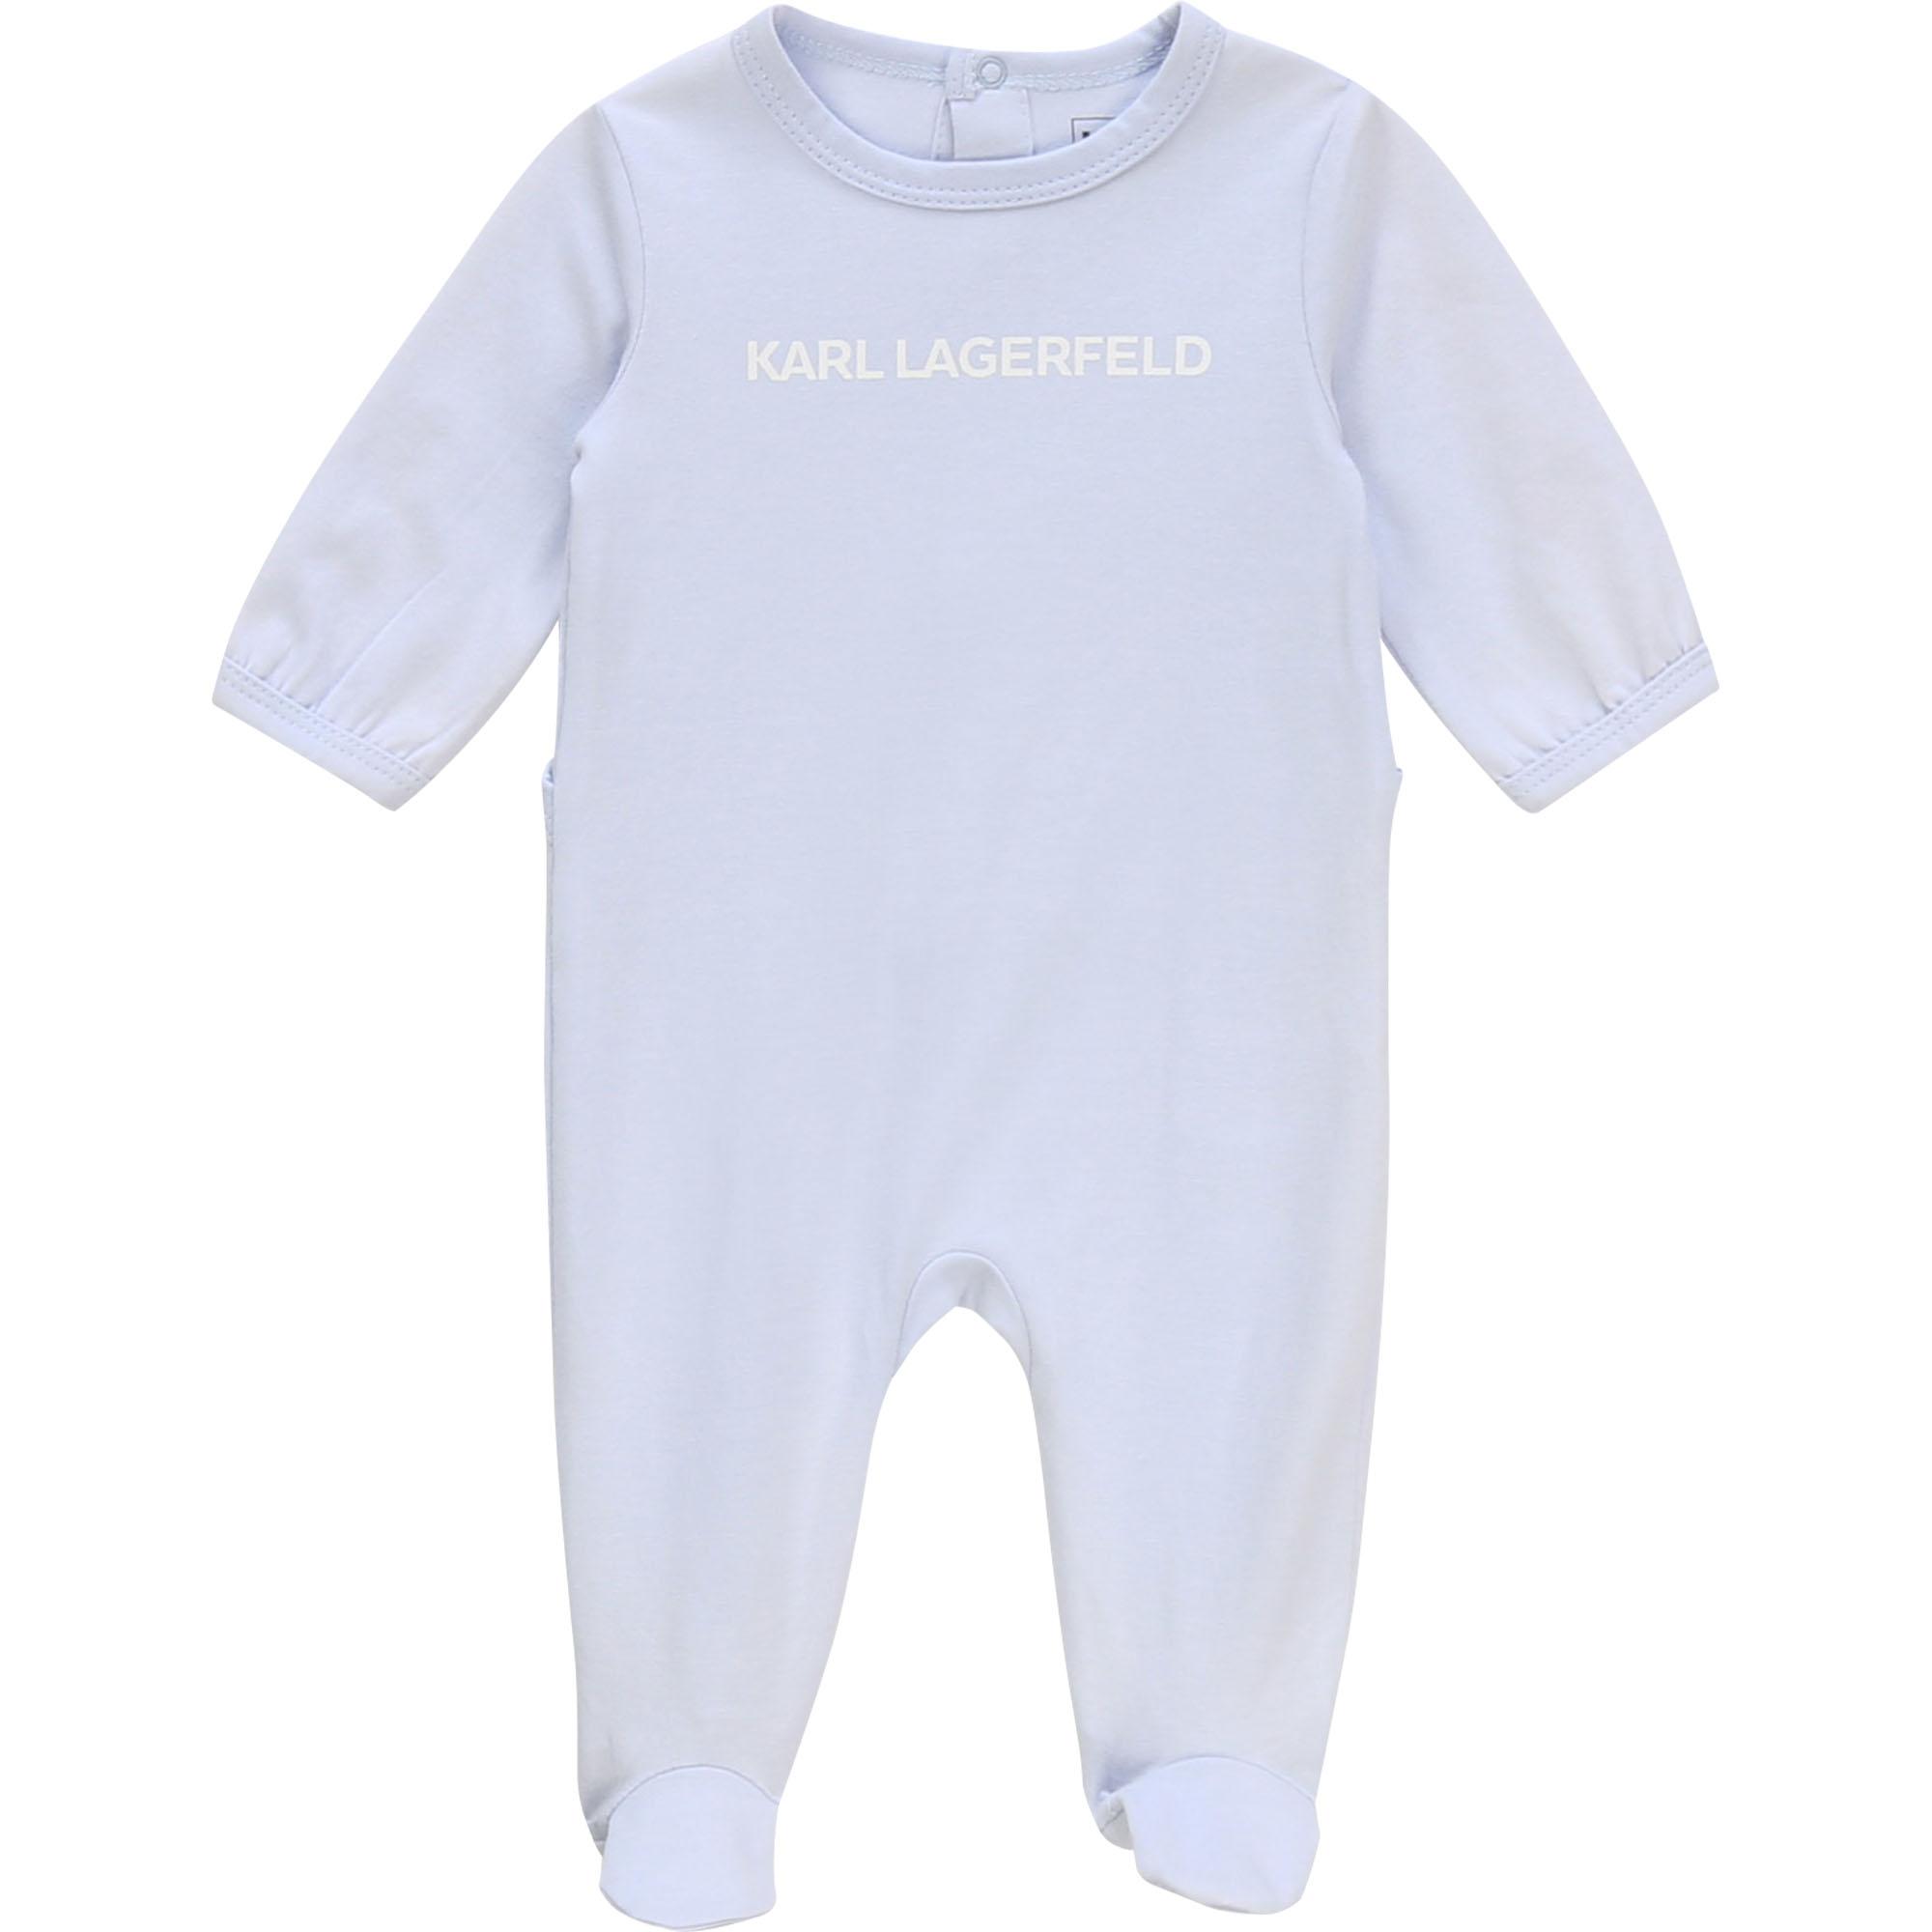 Pyjama intégral avec logo KARL LAGERFELD KIDS BEBE COUCHE UNISEXE Bleu